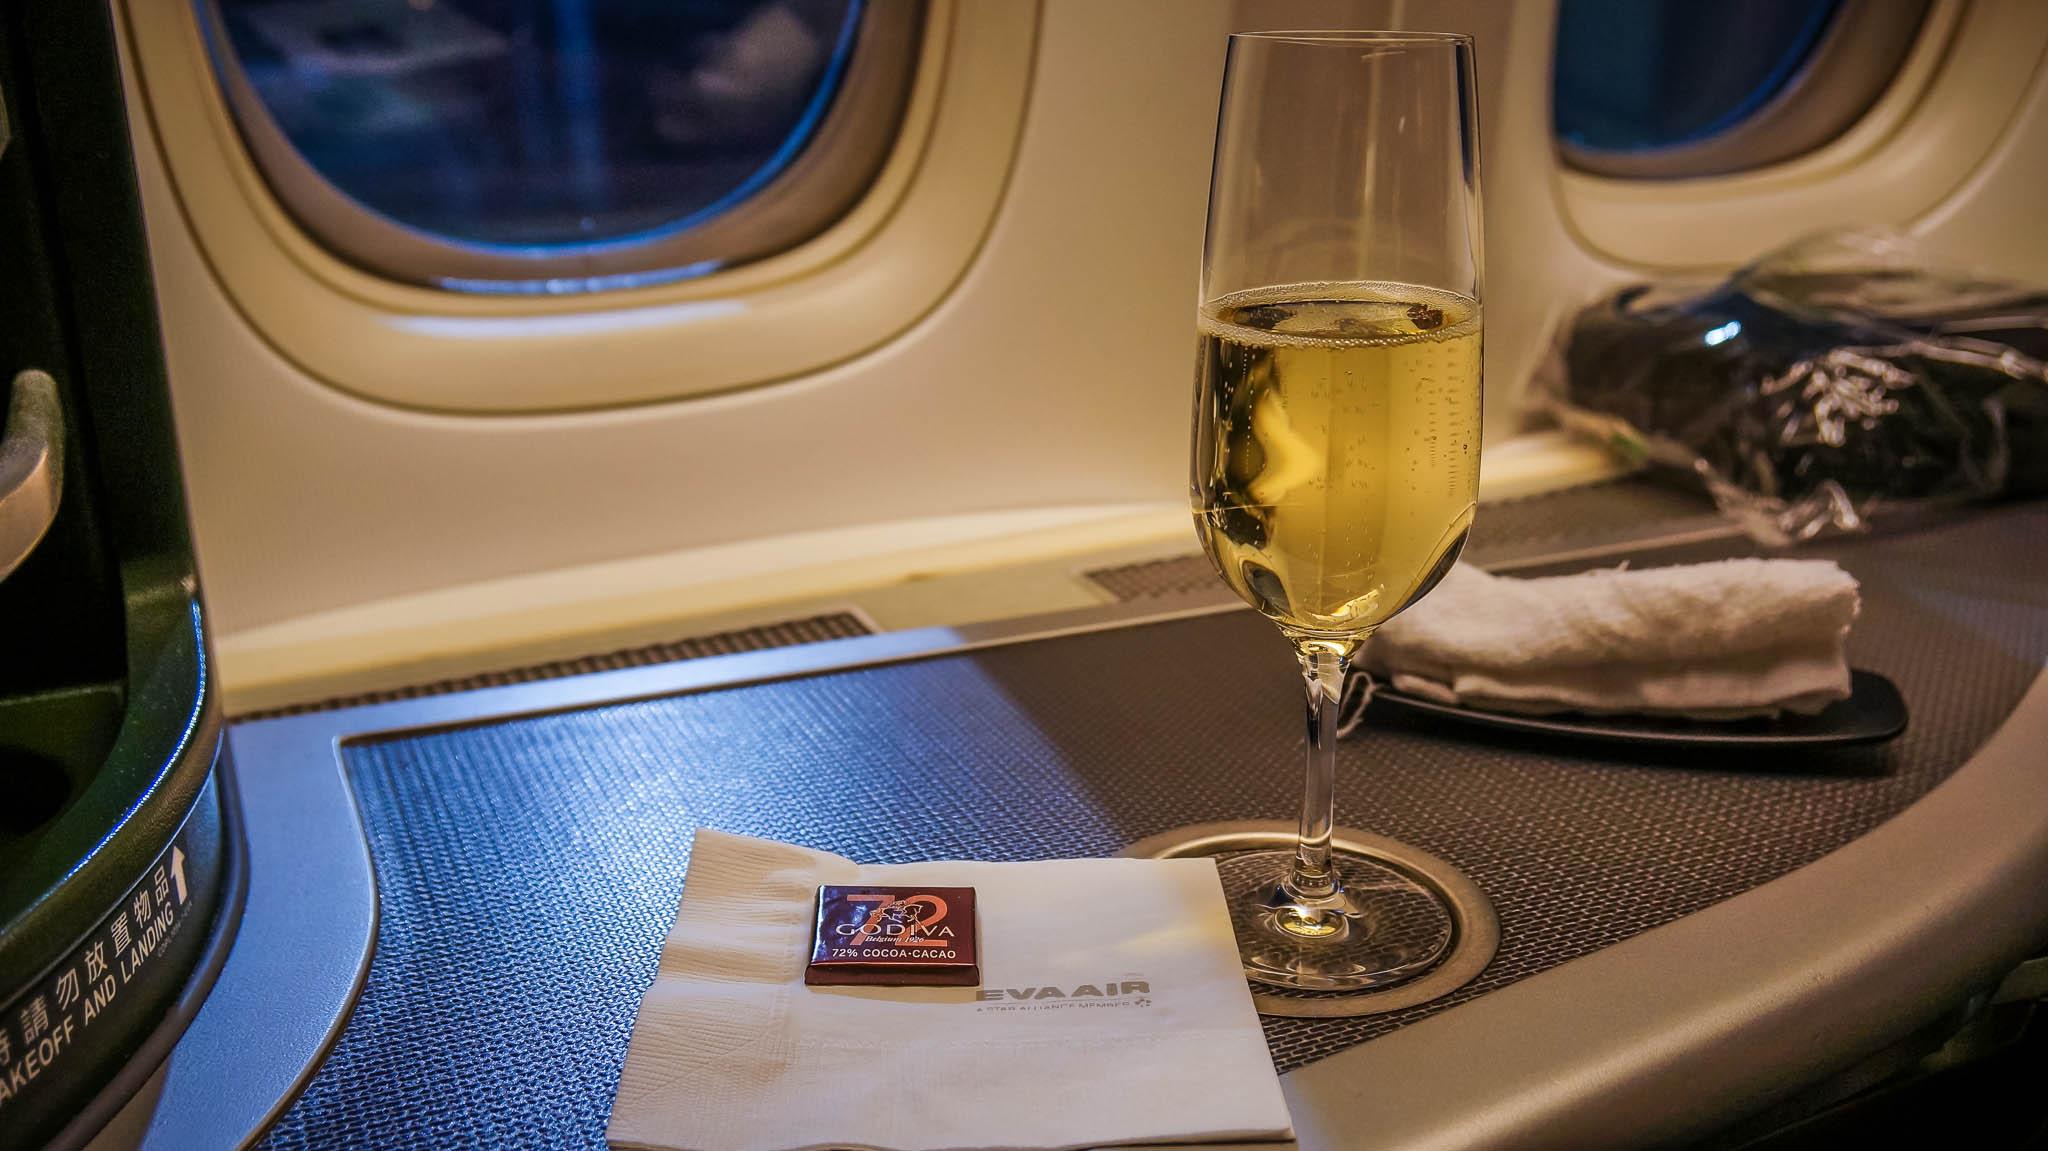 EVA Air business Class Angebote nach Asien